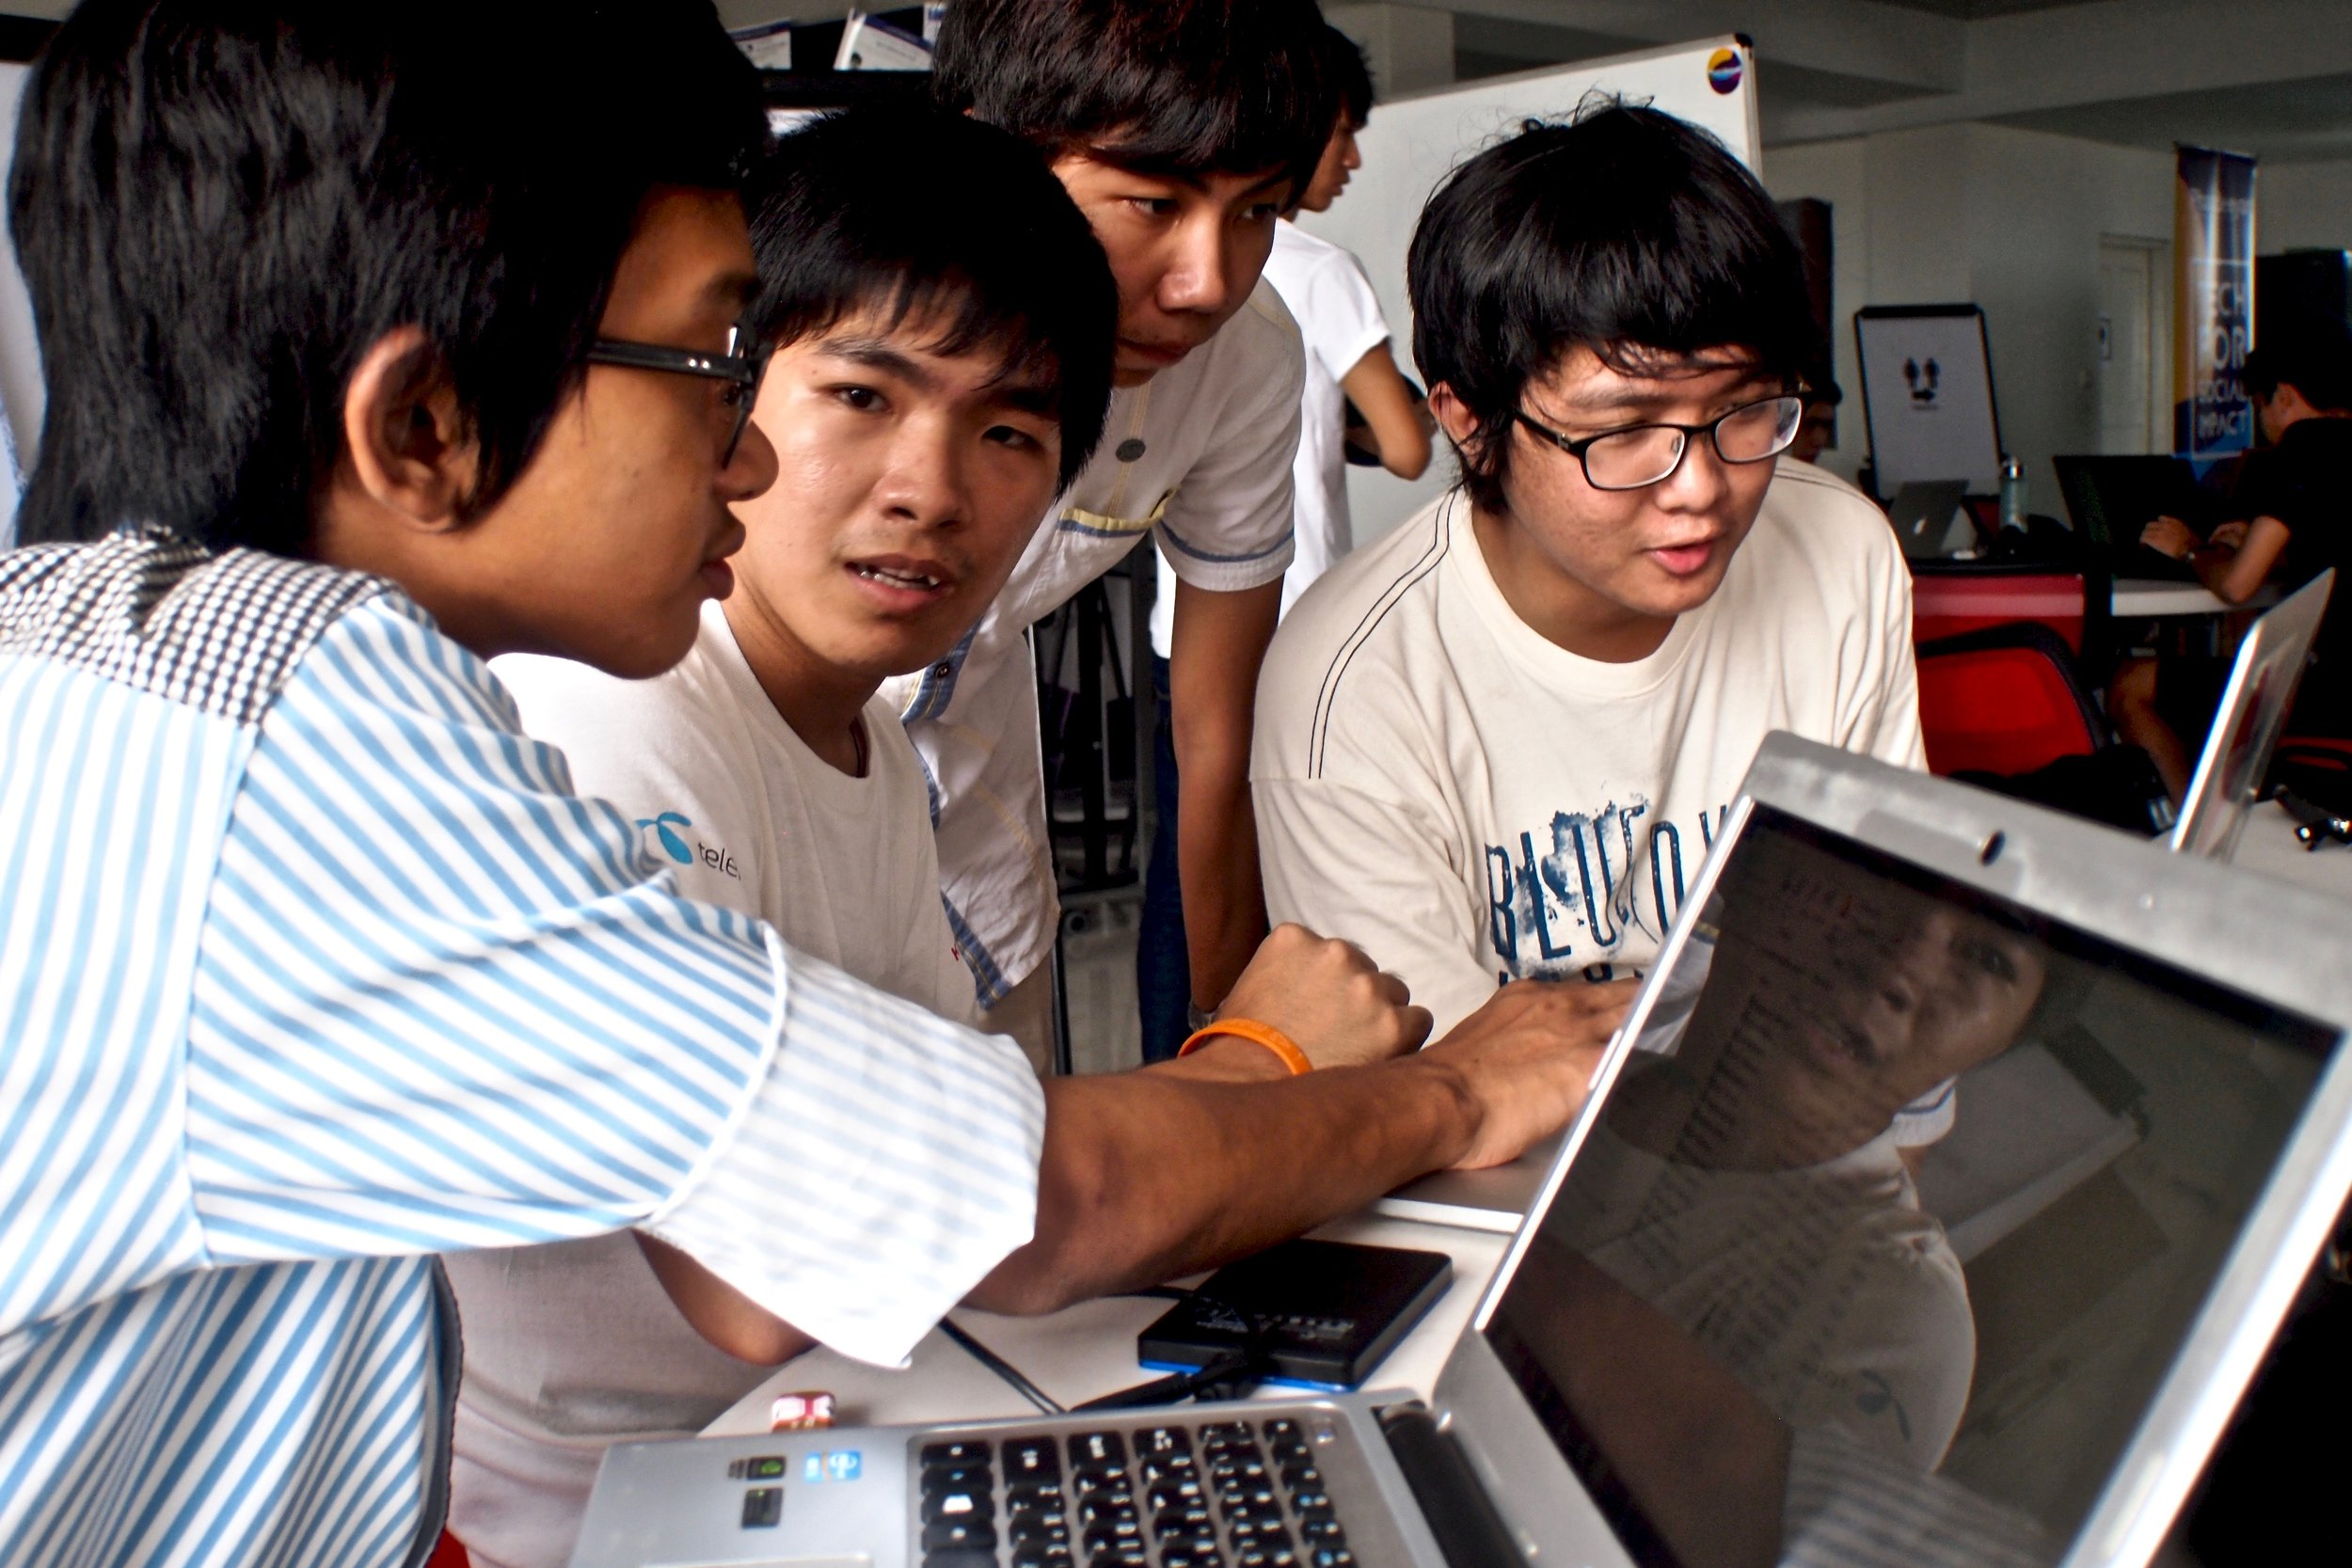 Civil hacking volunteers in Yangon, Myanmar. (C) Remko Tanis